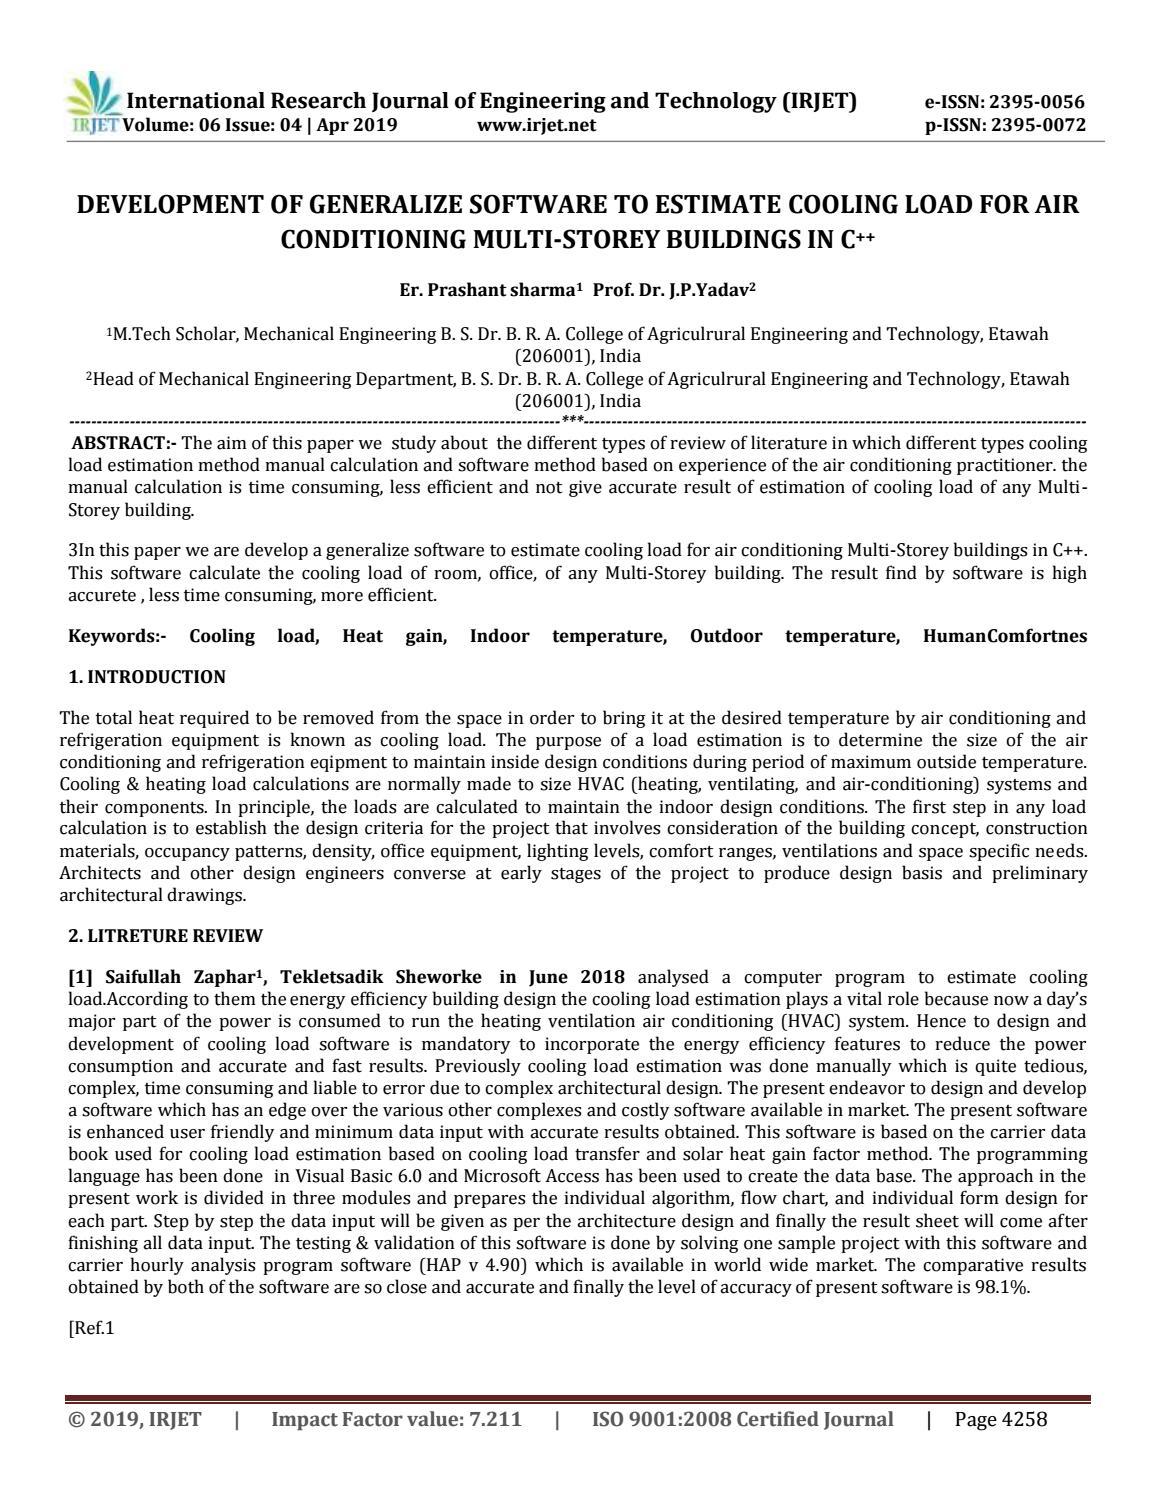 IRJET- Development of Generalize Software to Estimate